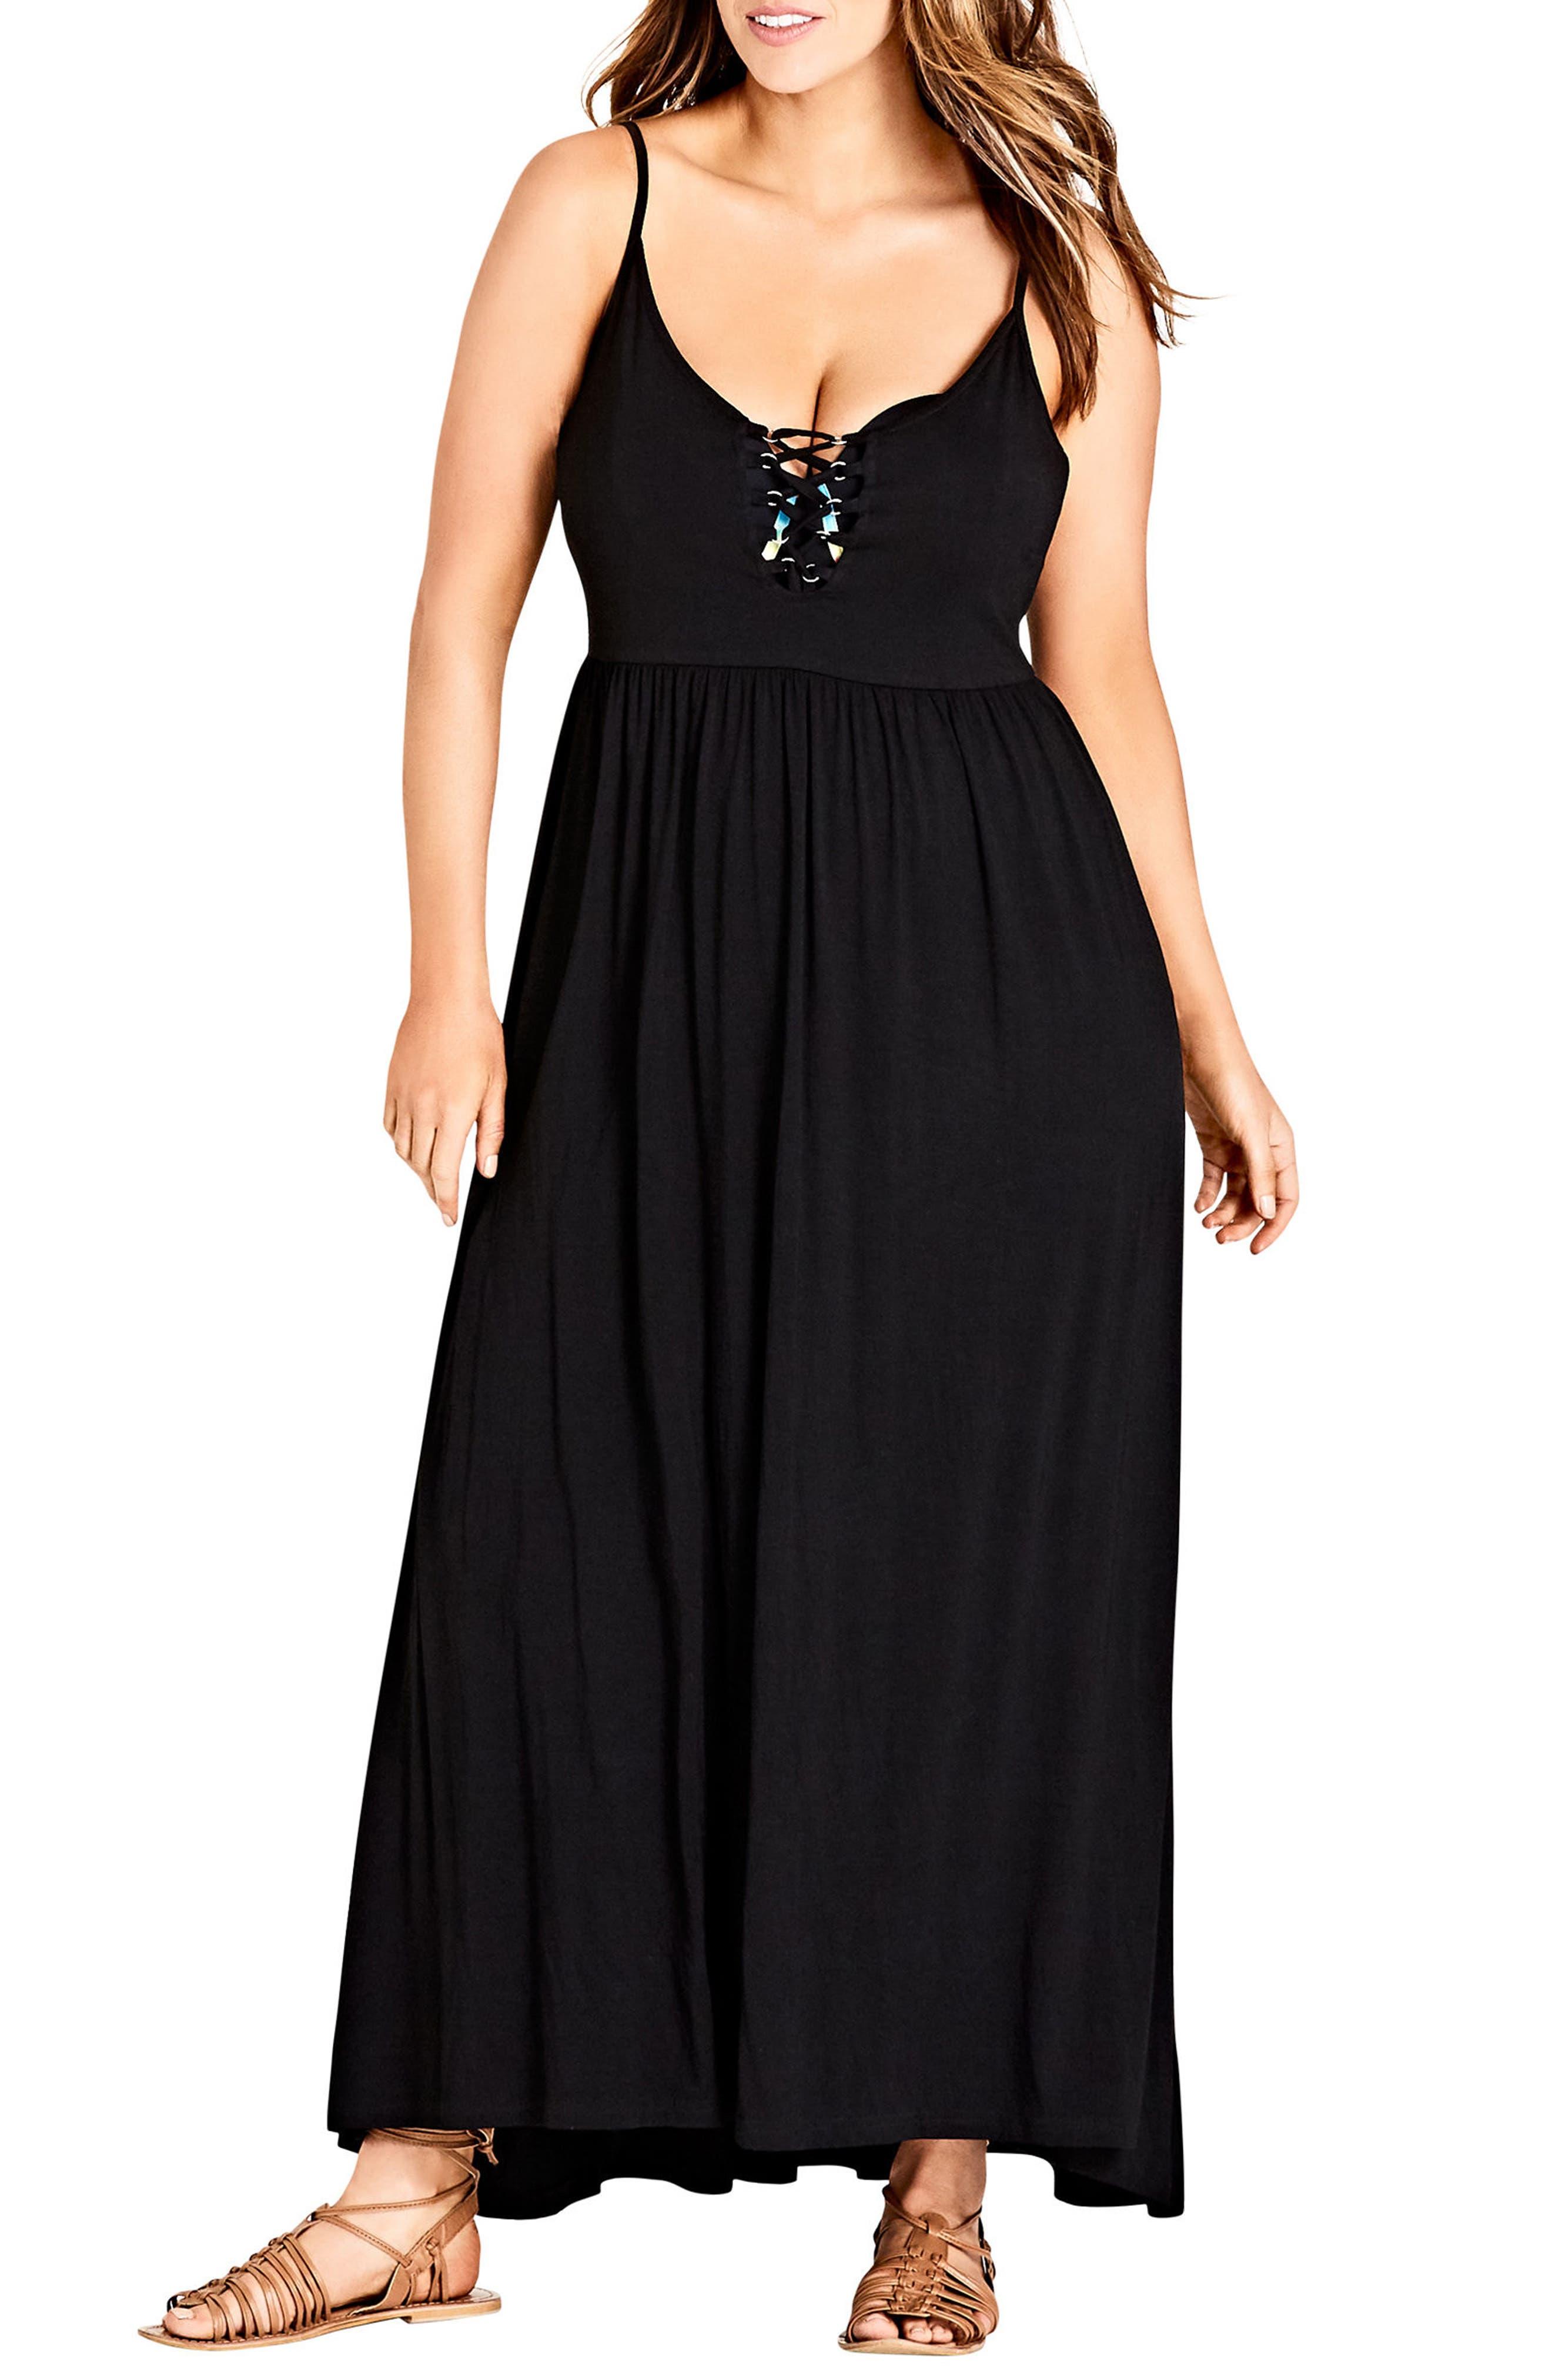 Lace Up Maxi Dress,                             Main thumbnail 1, color,                             Black